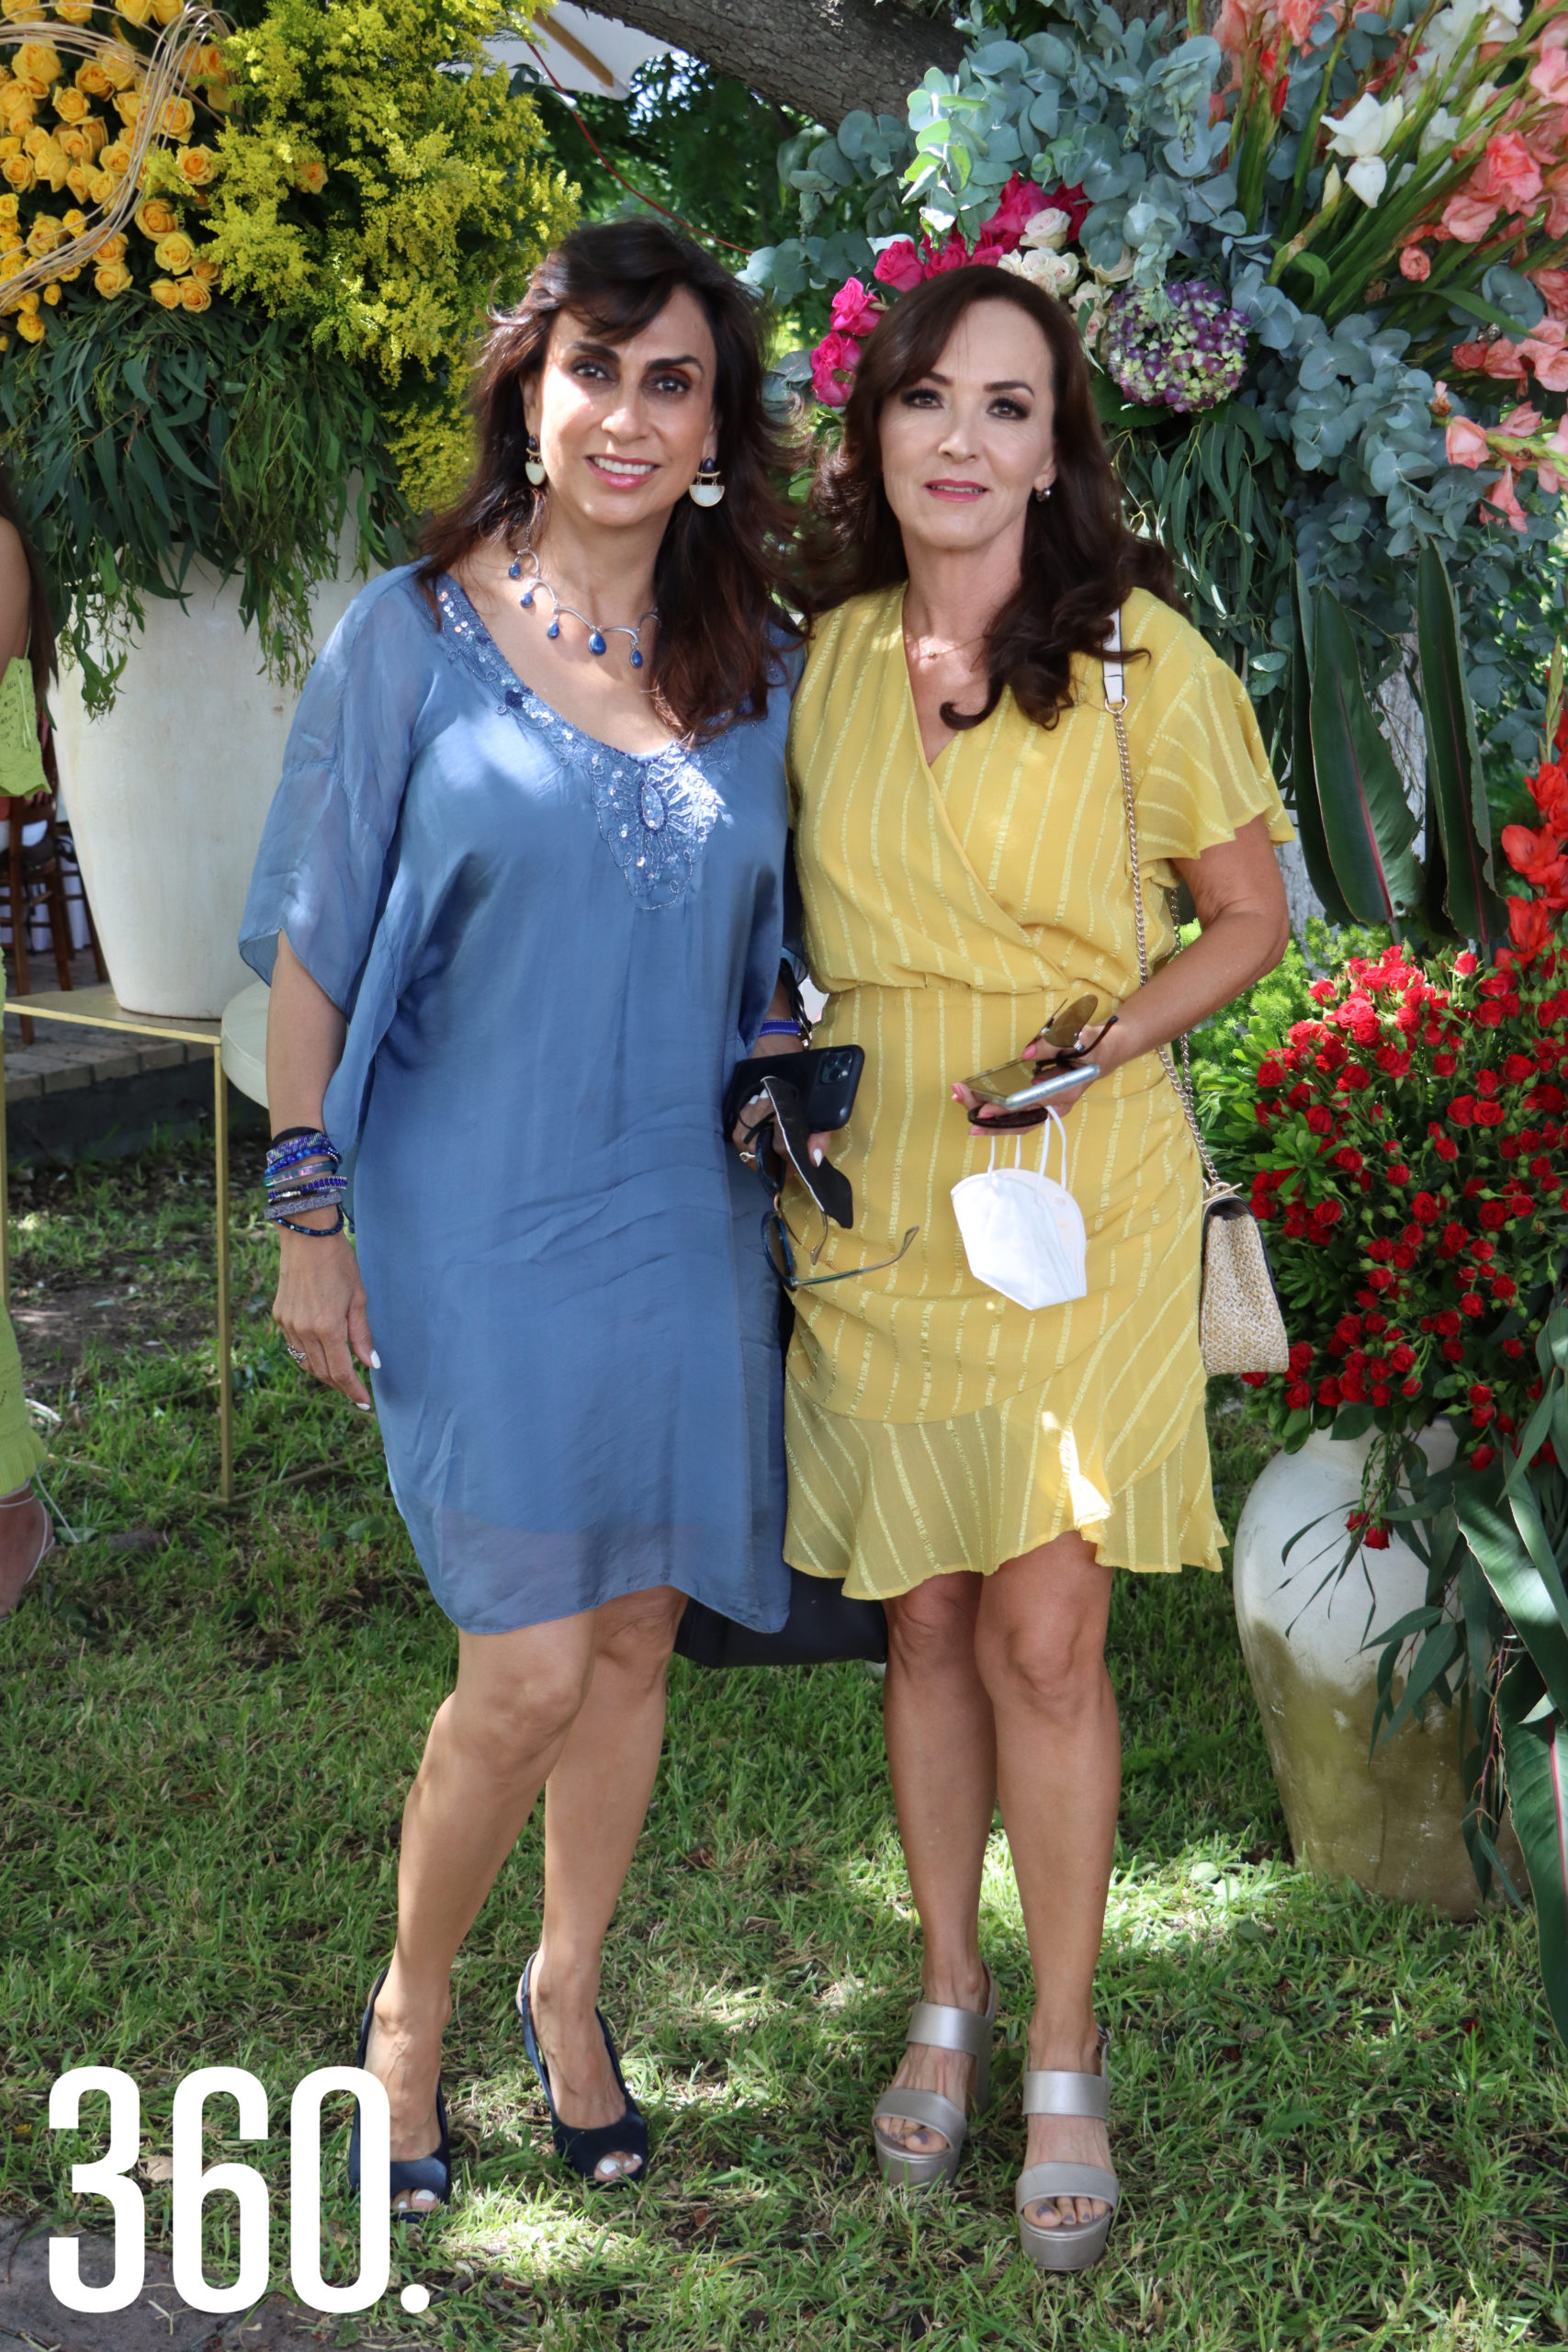 Mireya Ramos Arizpe y Margarita Herrera.